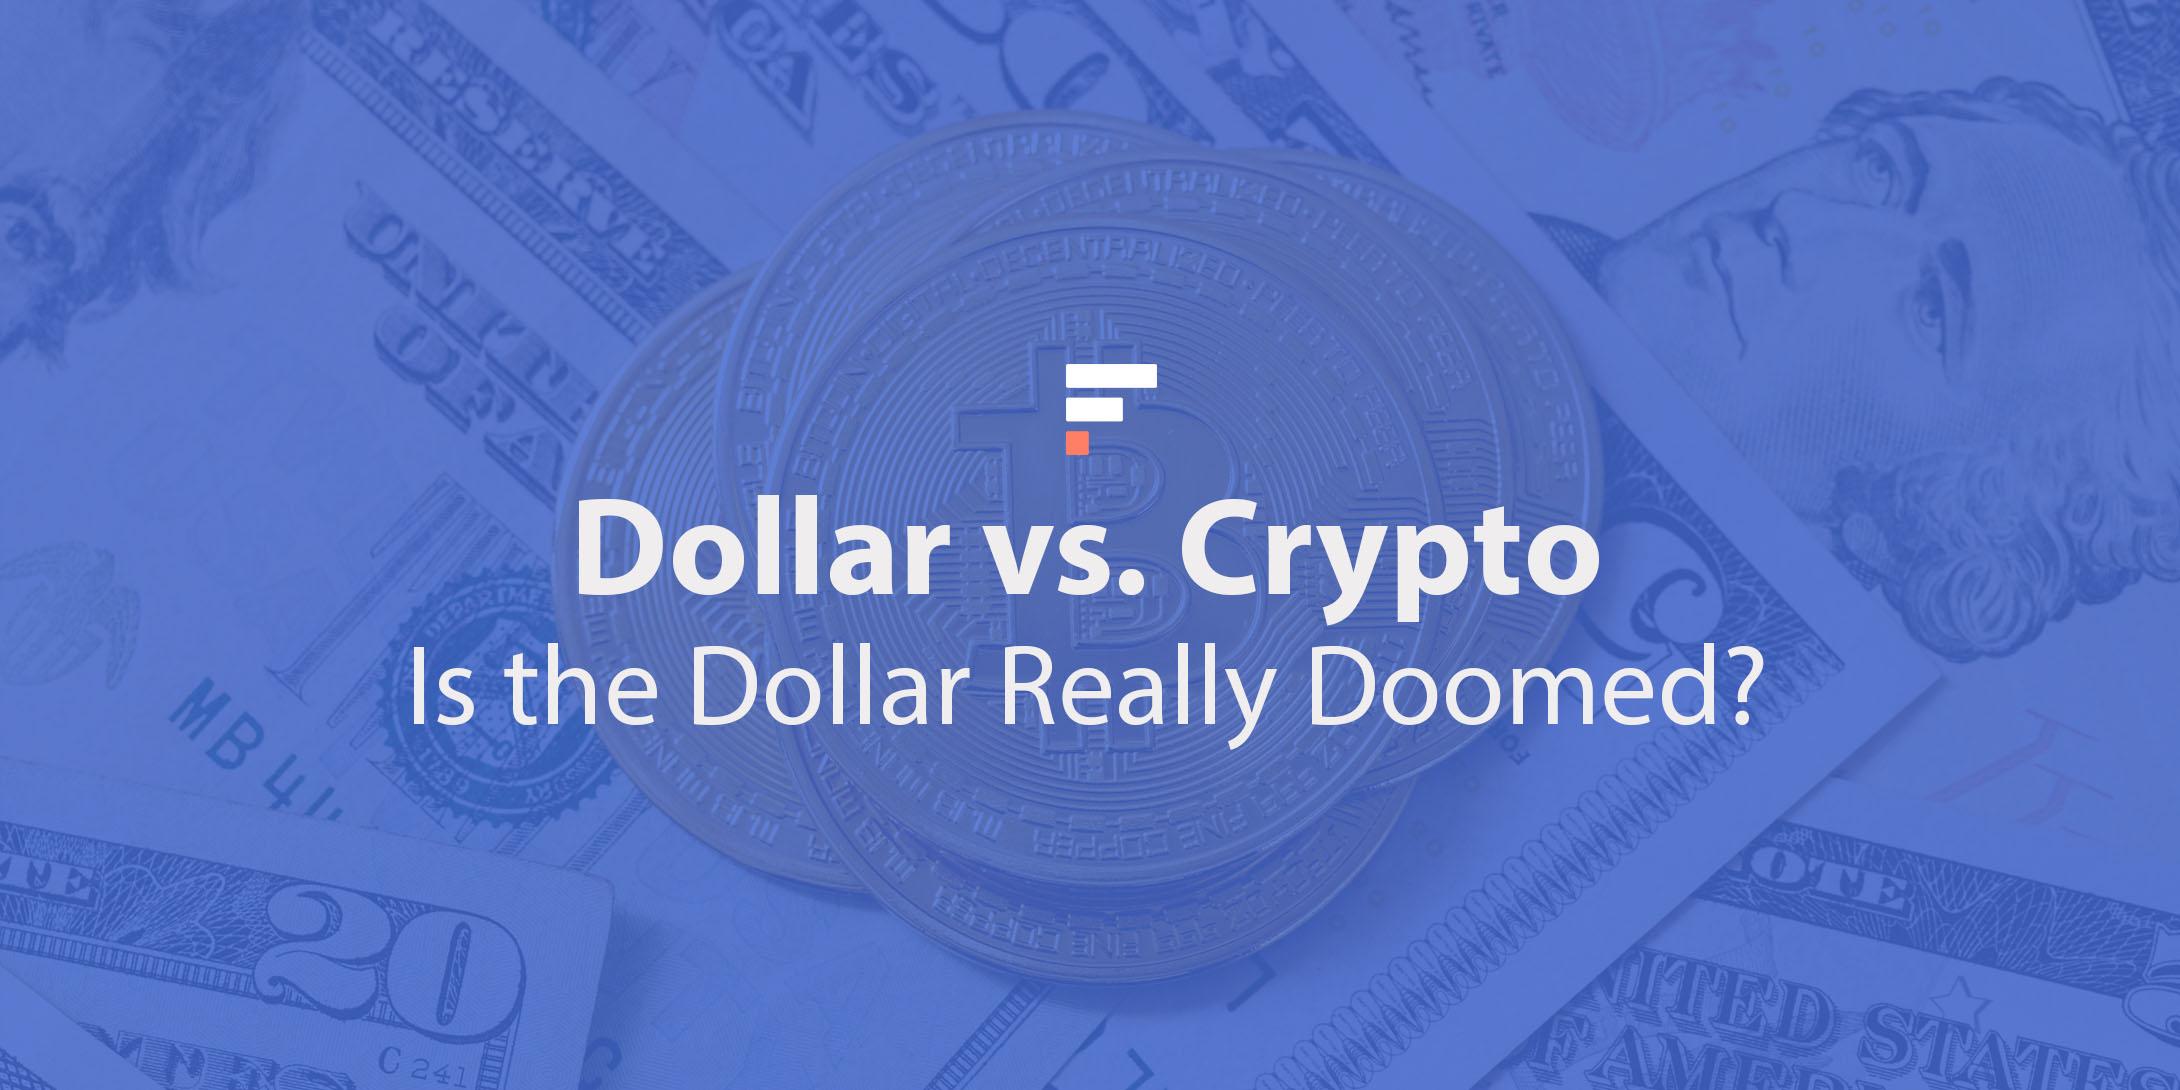 Dollar vs. Crypto